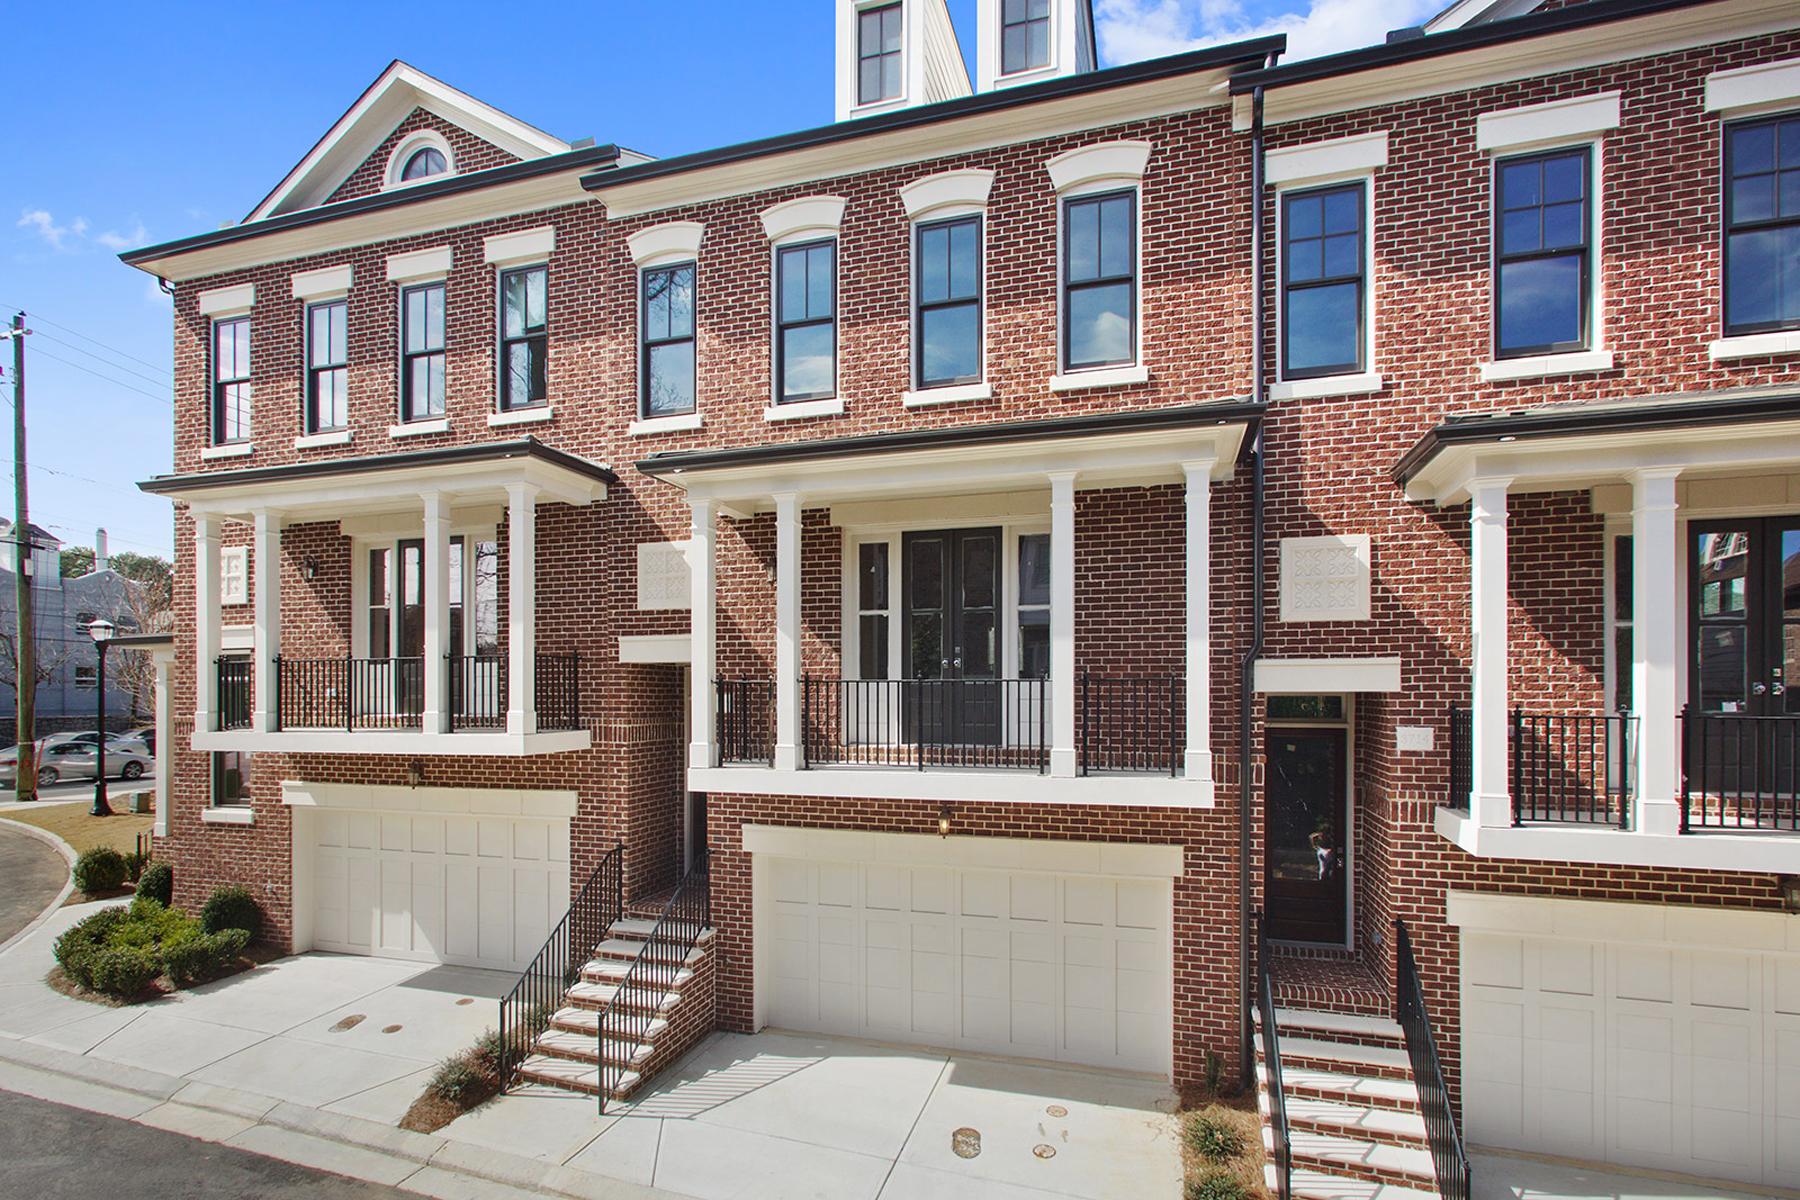 Townhouse for Sale at 3700 Peachtree 3700 Peachtree Road #2 Atlanta, Georgia, 30319 United States